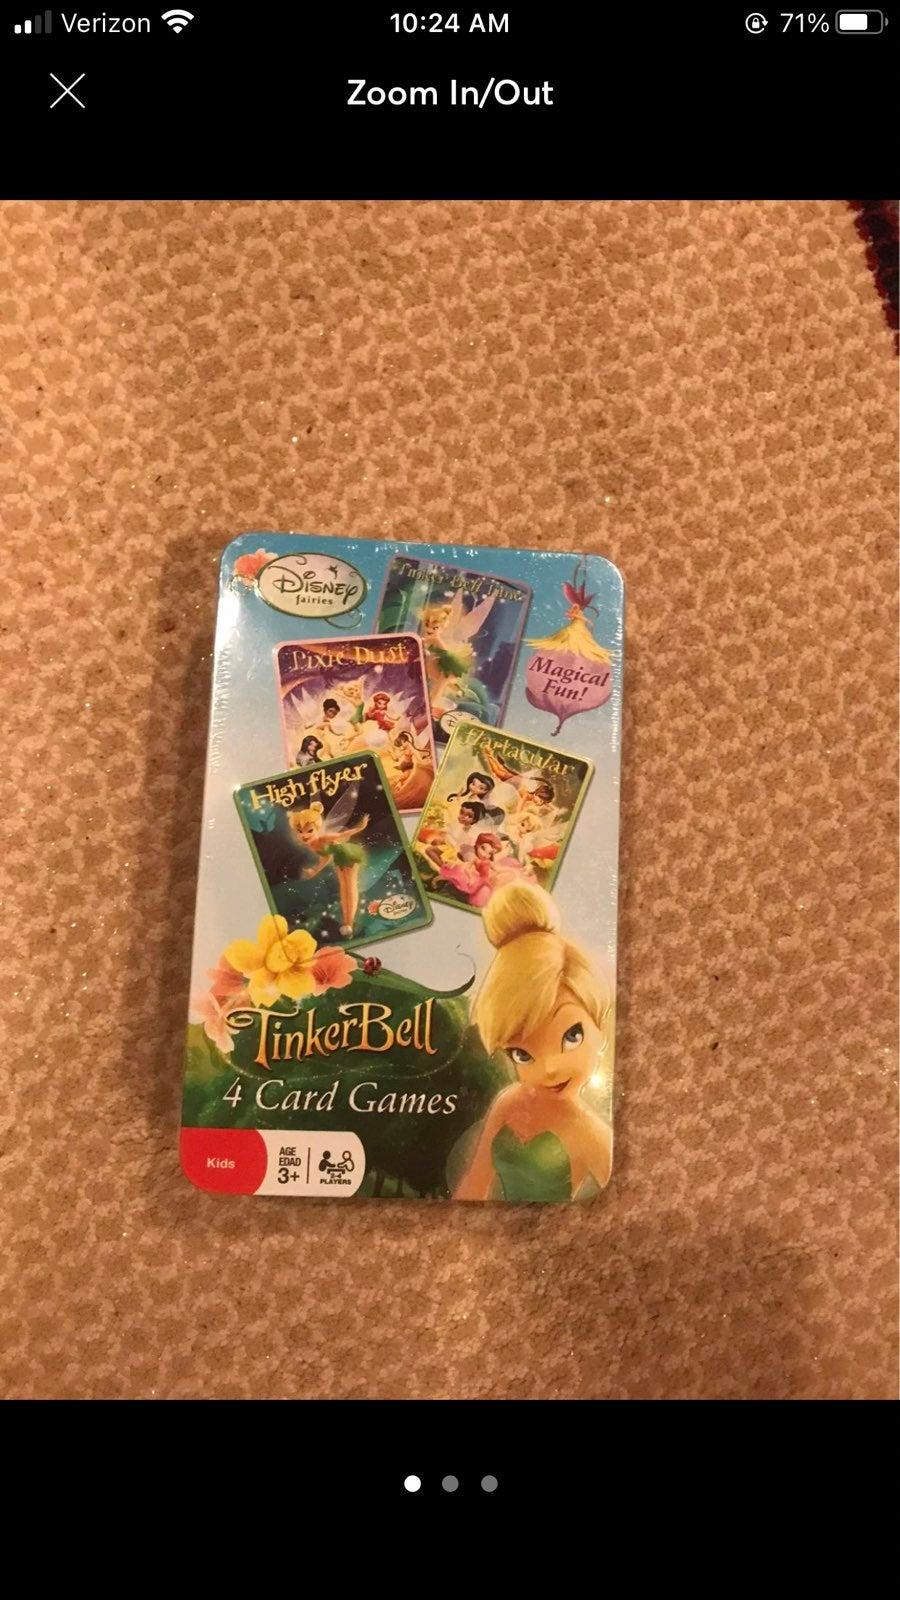 New Disney Tinker Bell 4 Card Games